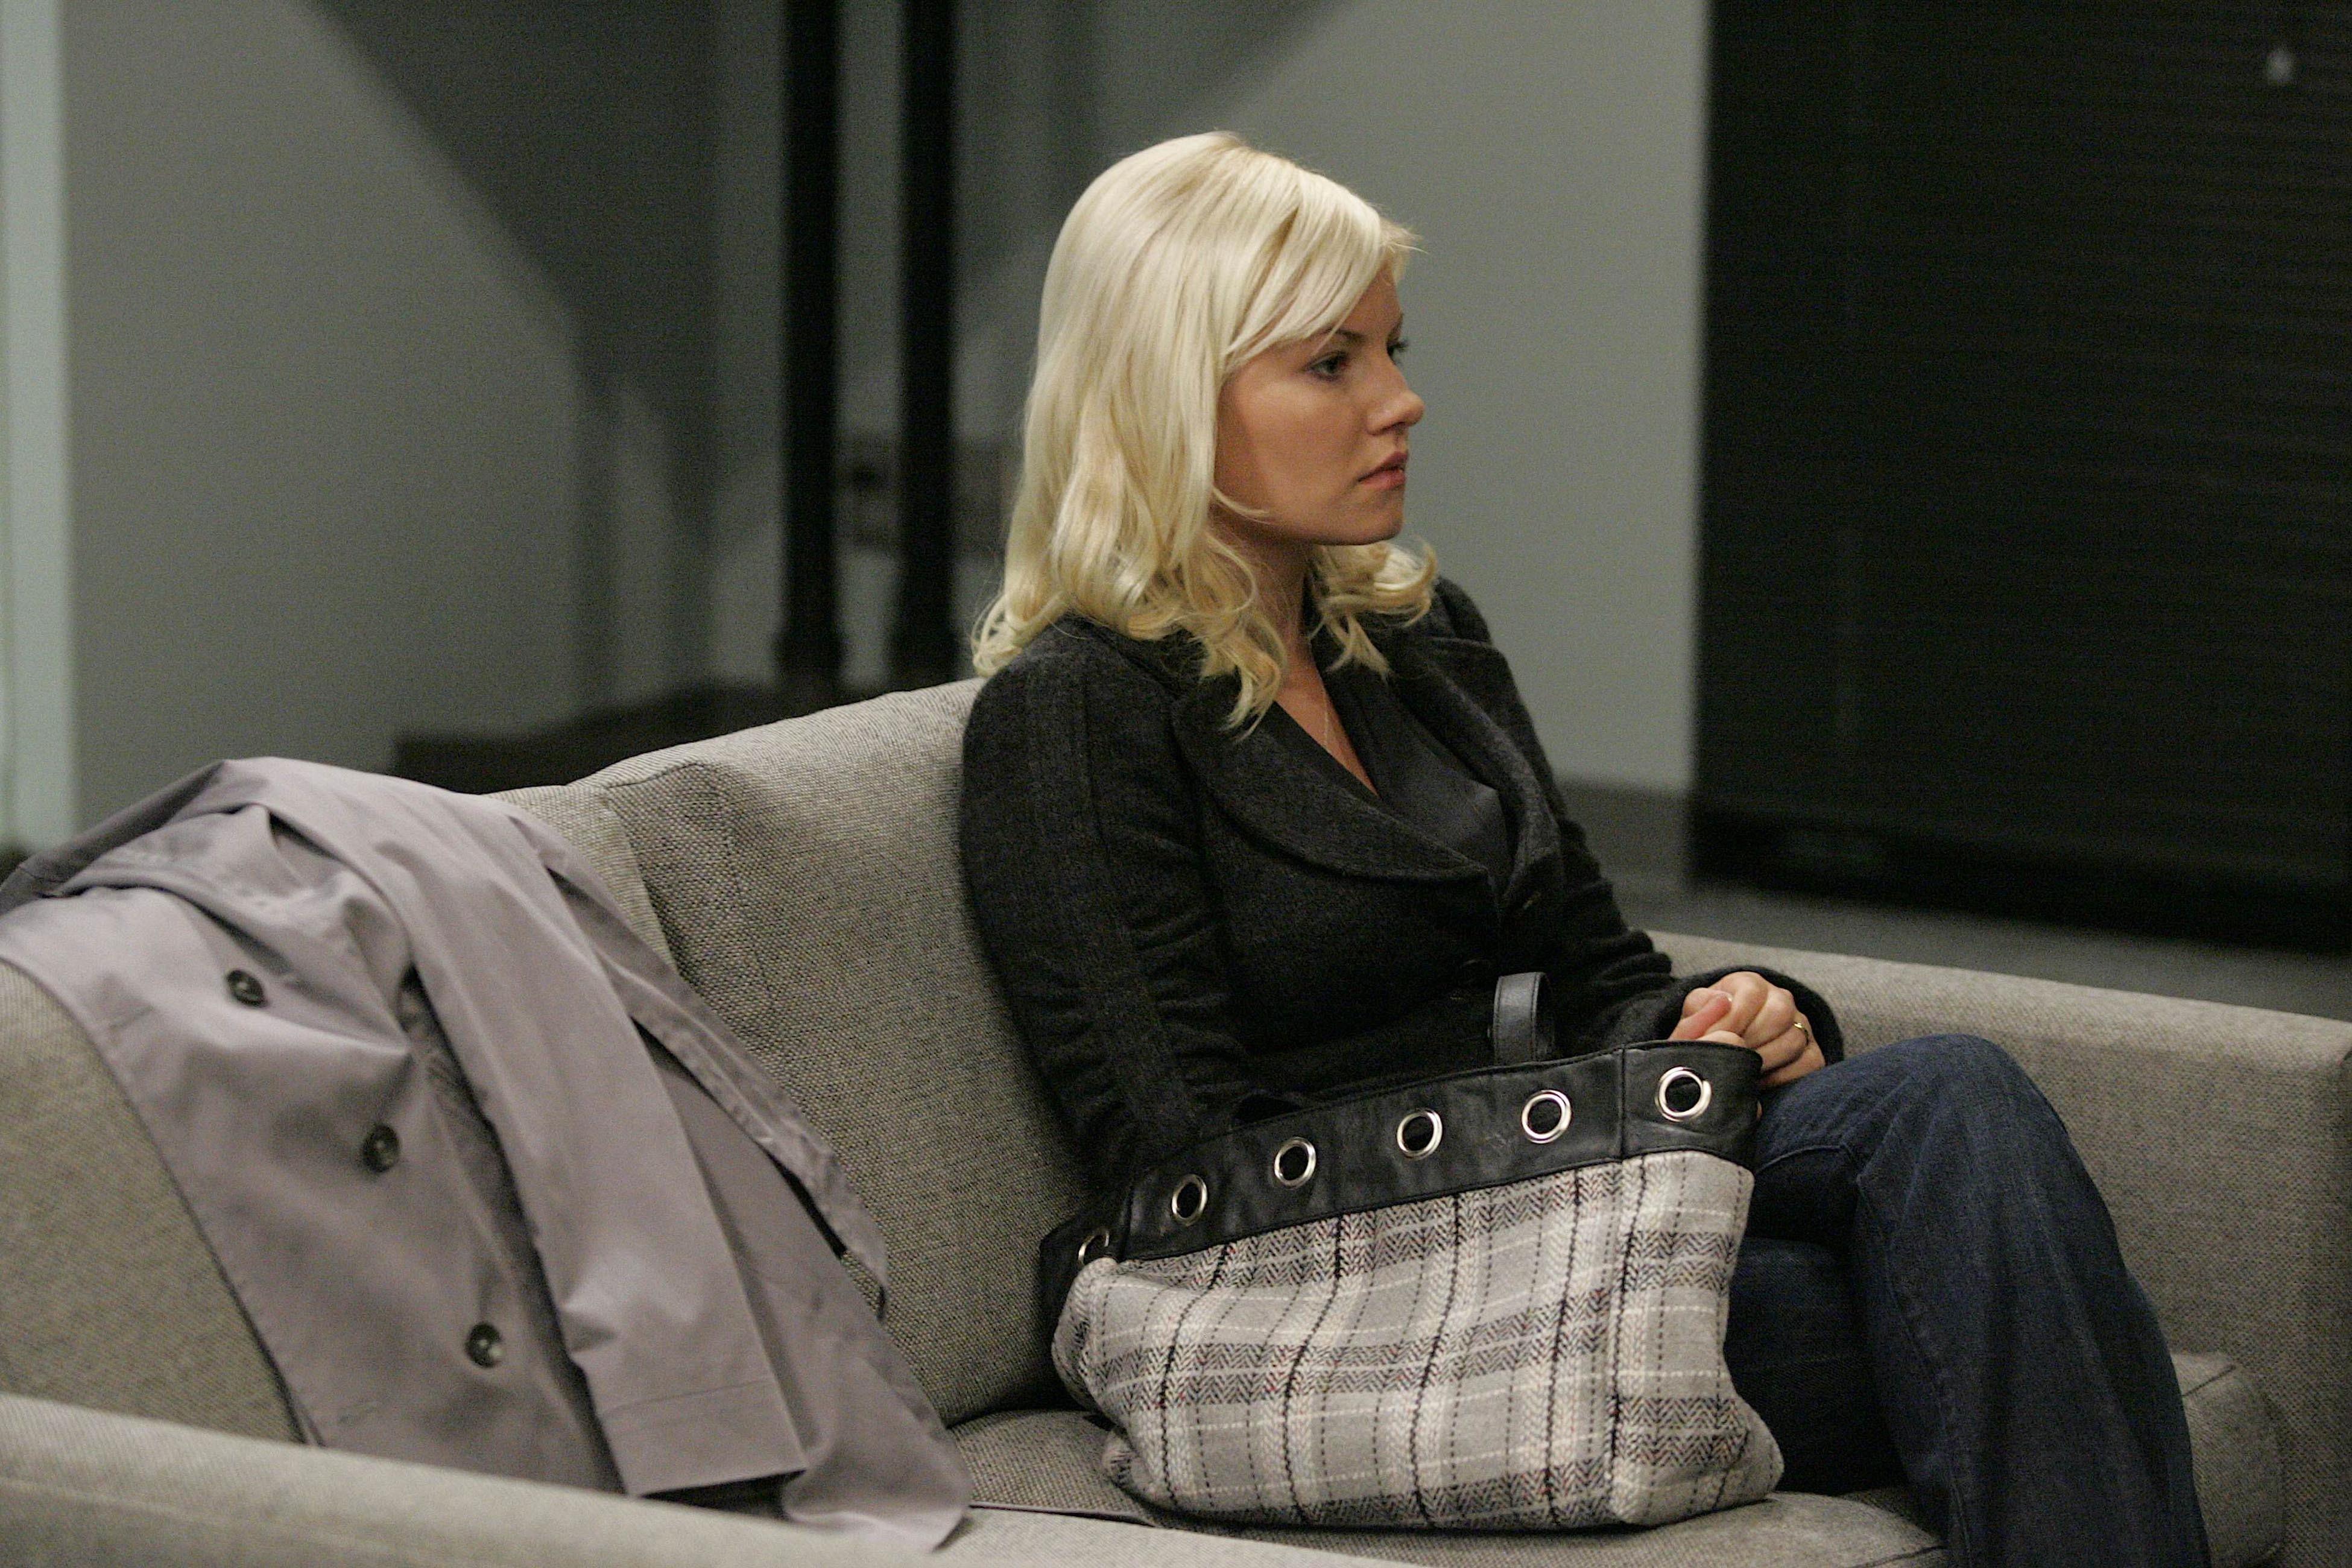 Elisha Cuthbert as Kim Bauer 24 Season 7 Episode 18 - 24